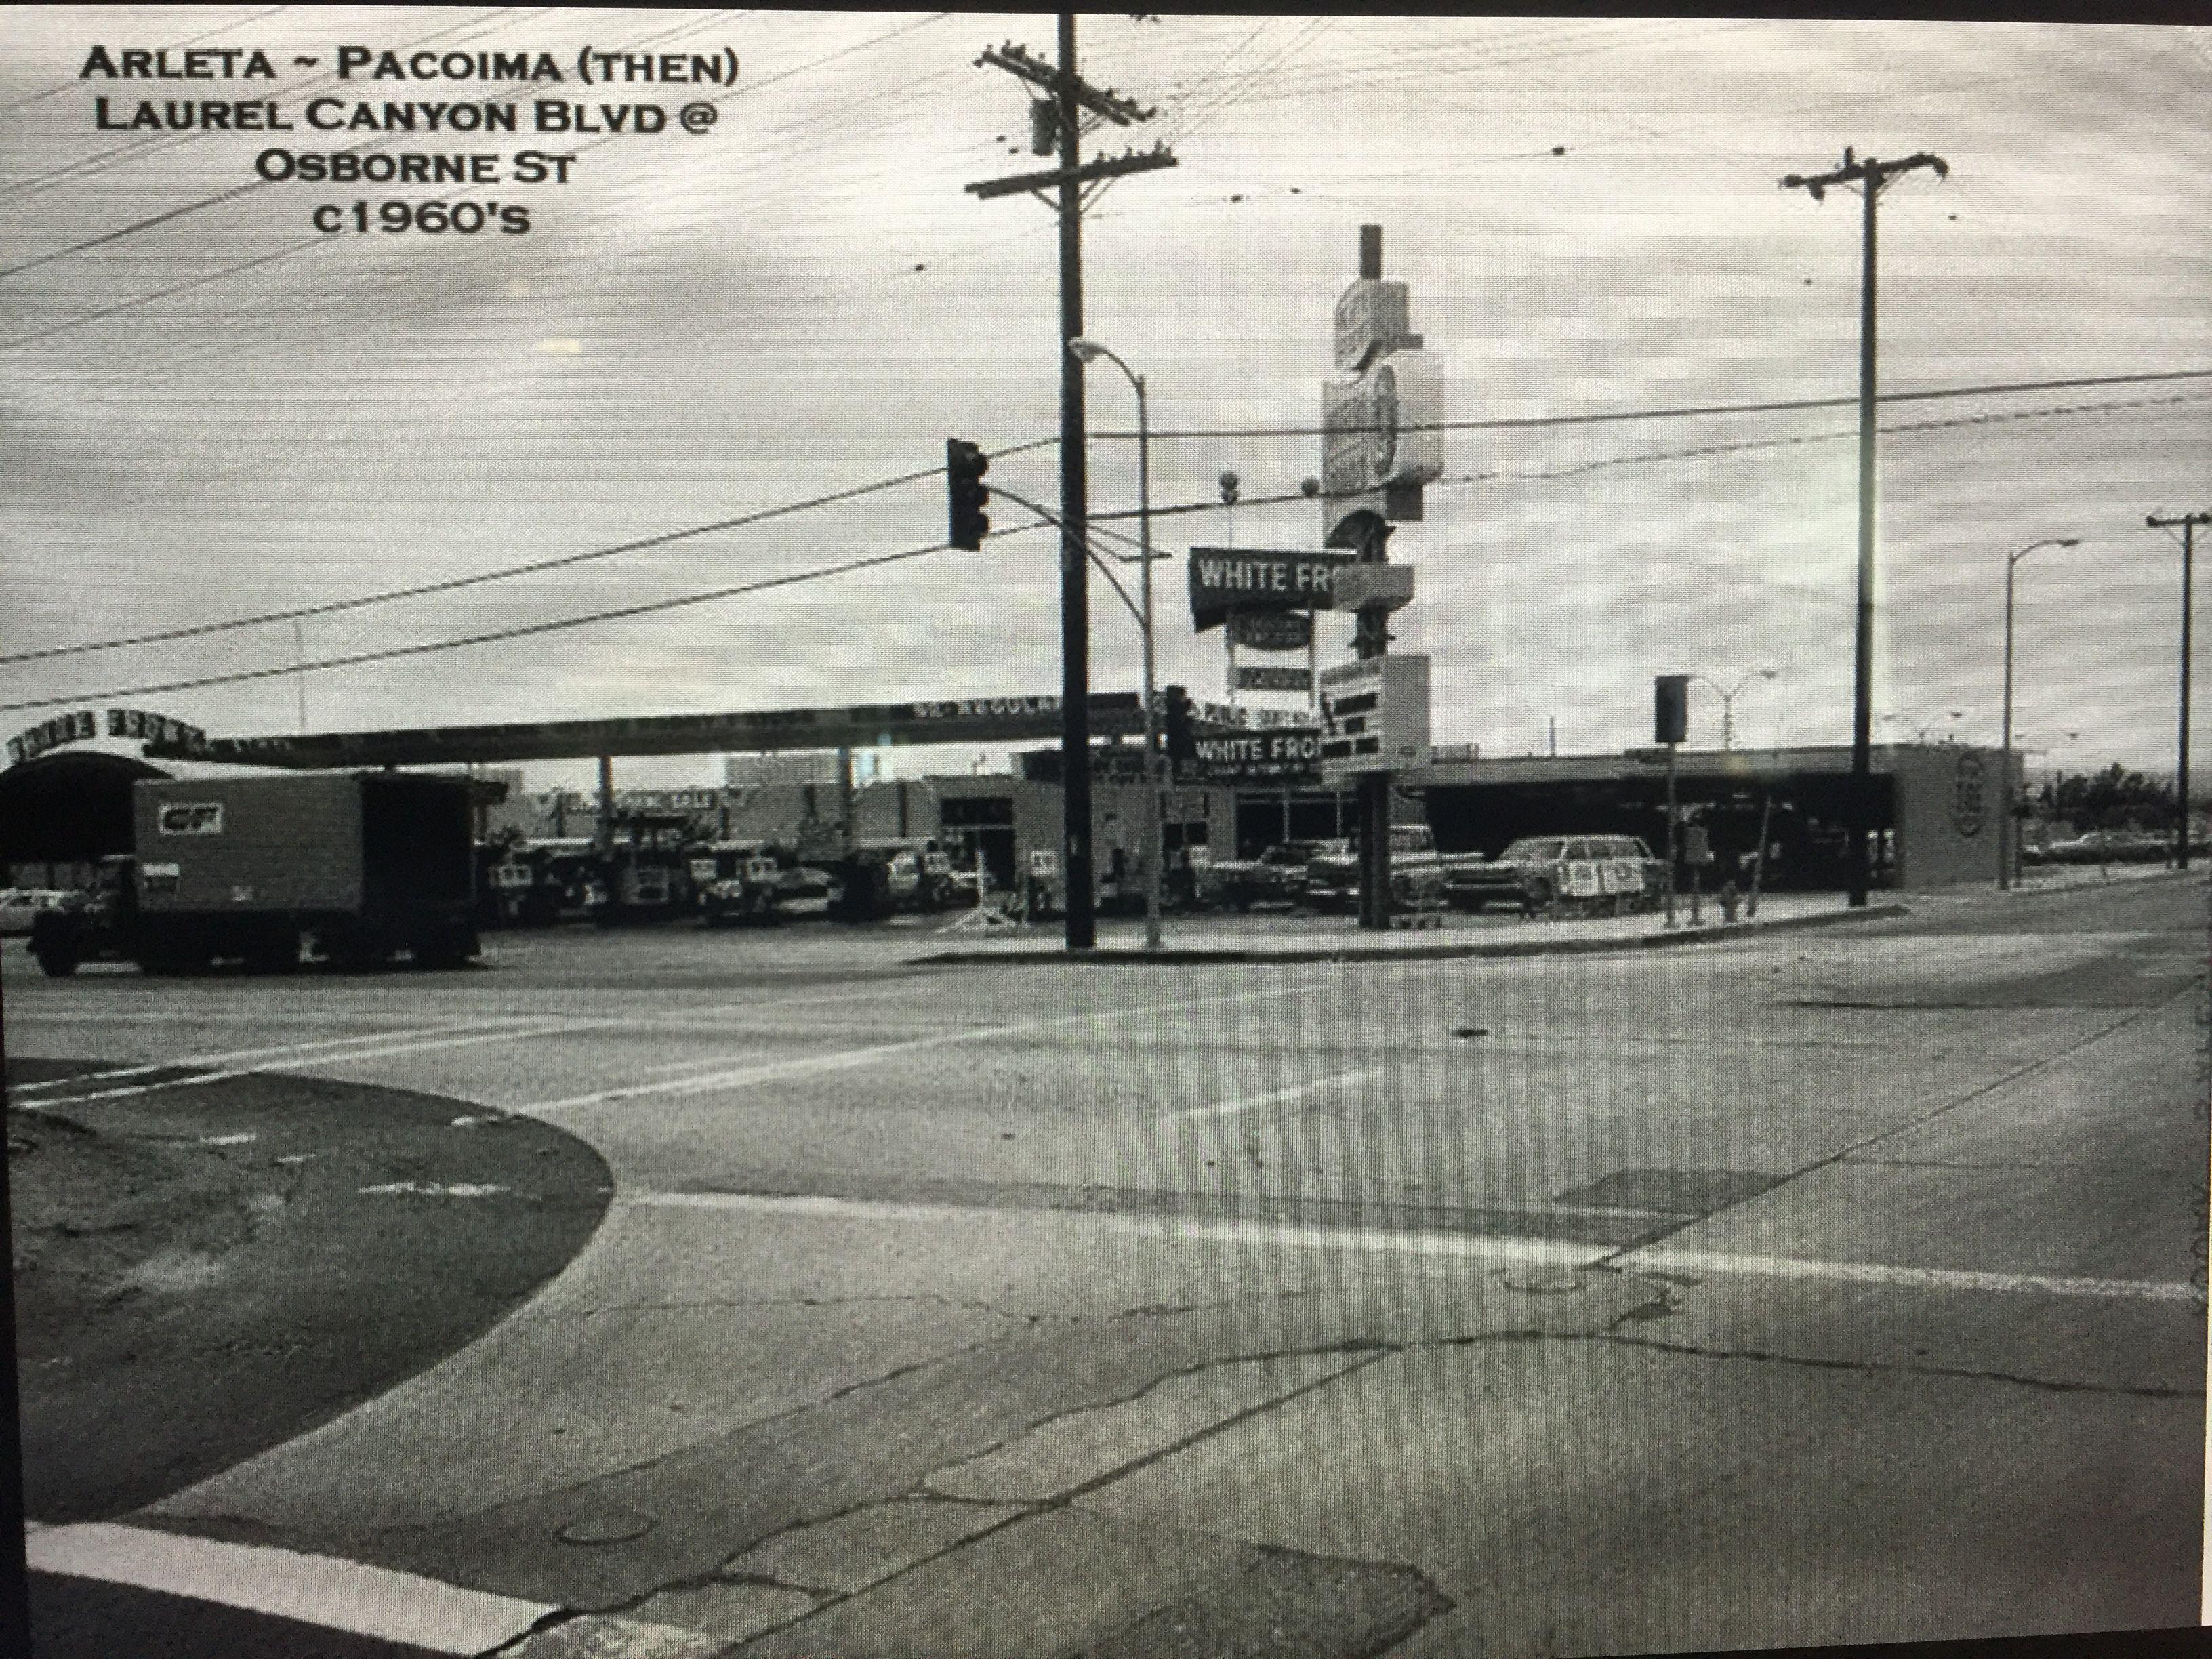 Pin By Christine Randenberg On Greater Los Angeles Laurel Canyon Arleta Vintage Los Angeles